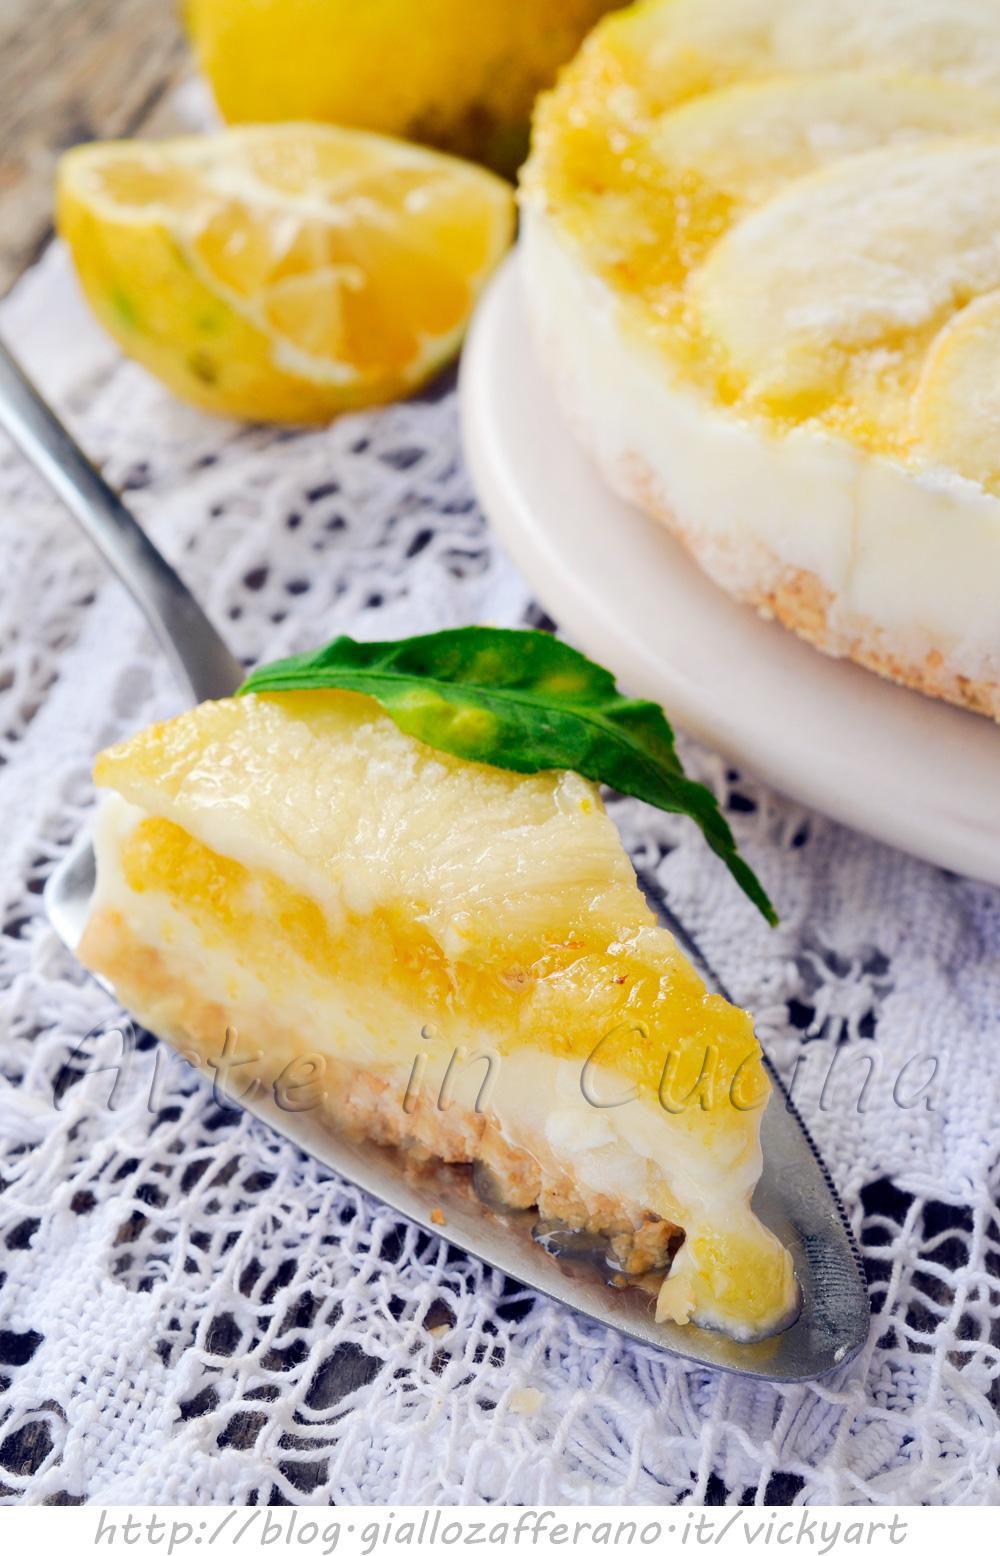 Torta senza cottura al limone ricotta e mandorle vickyart arte in cucina